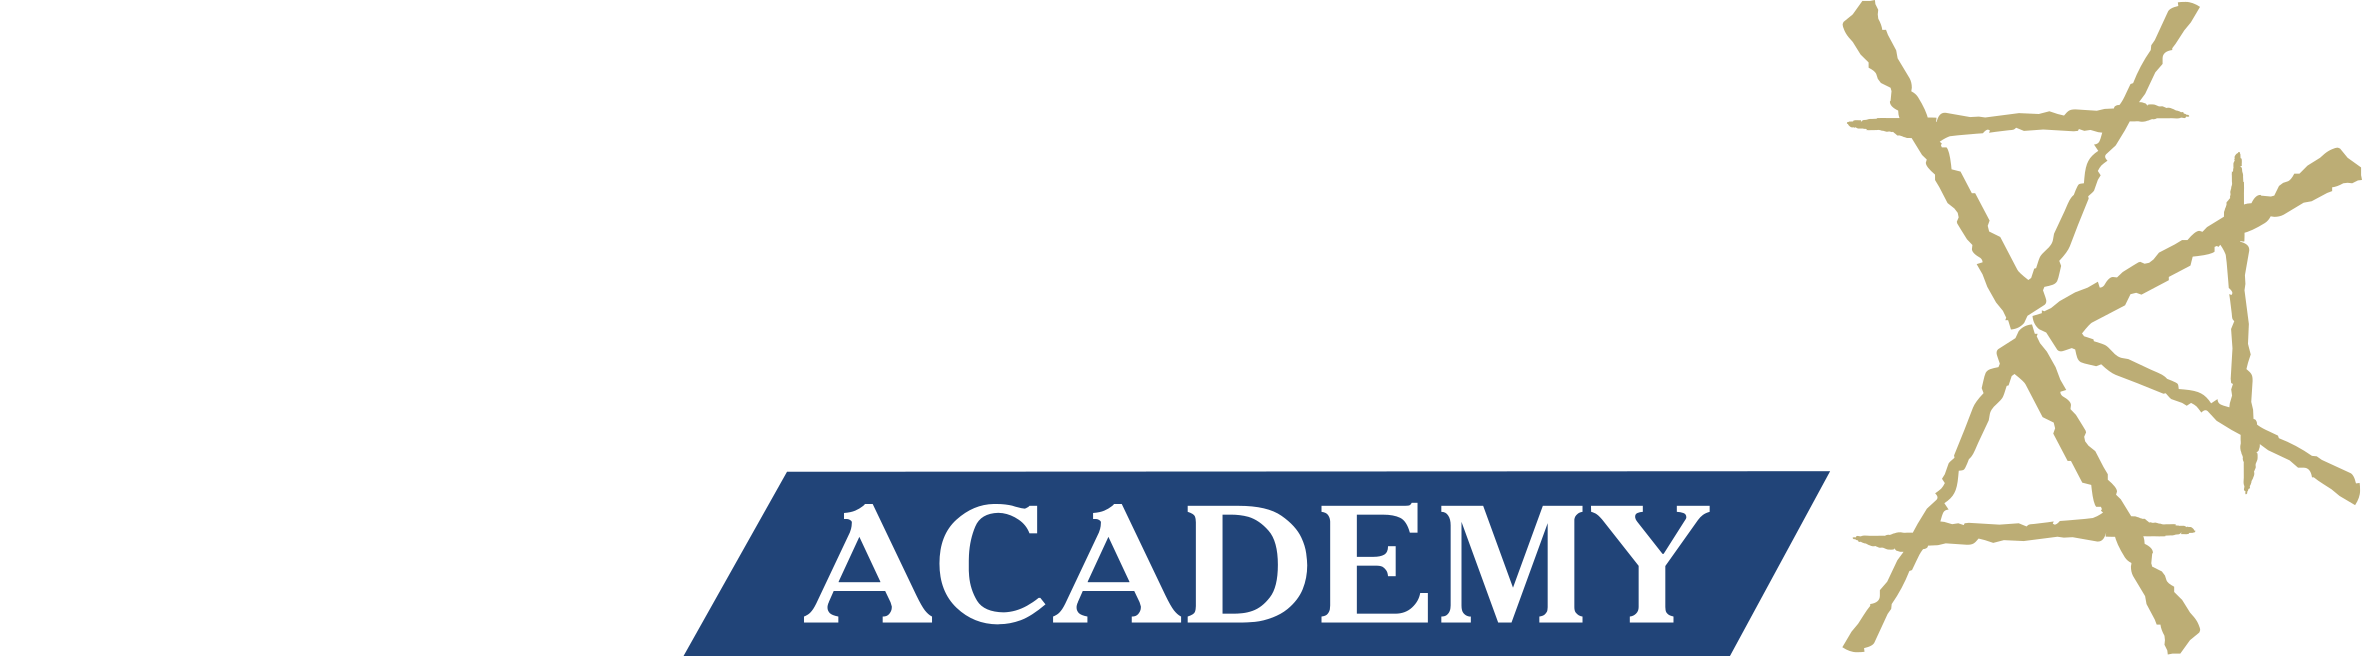 CAMNES Academy logo